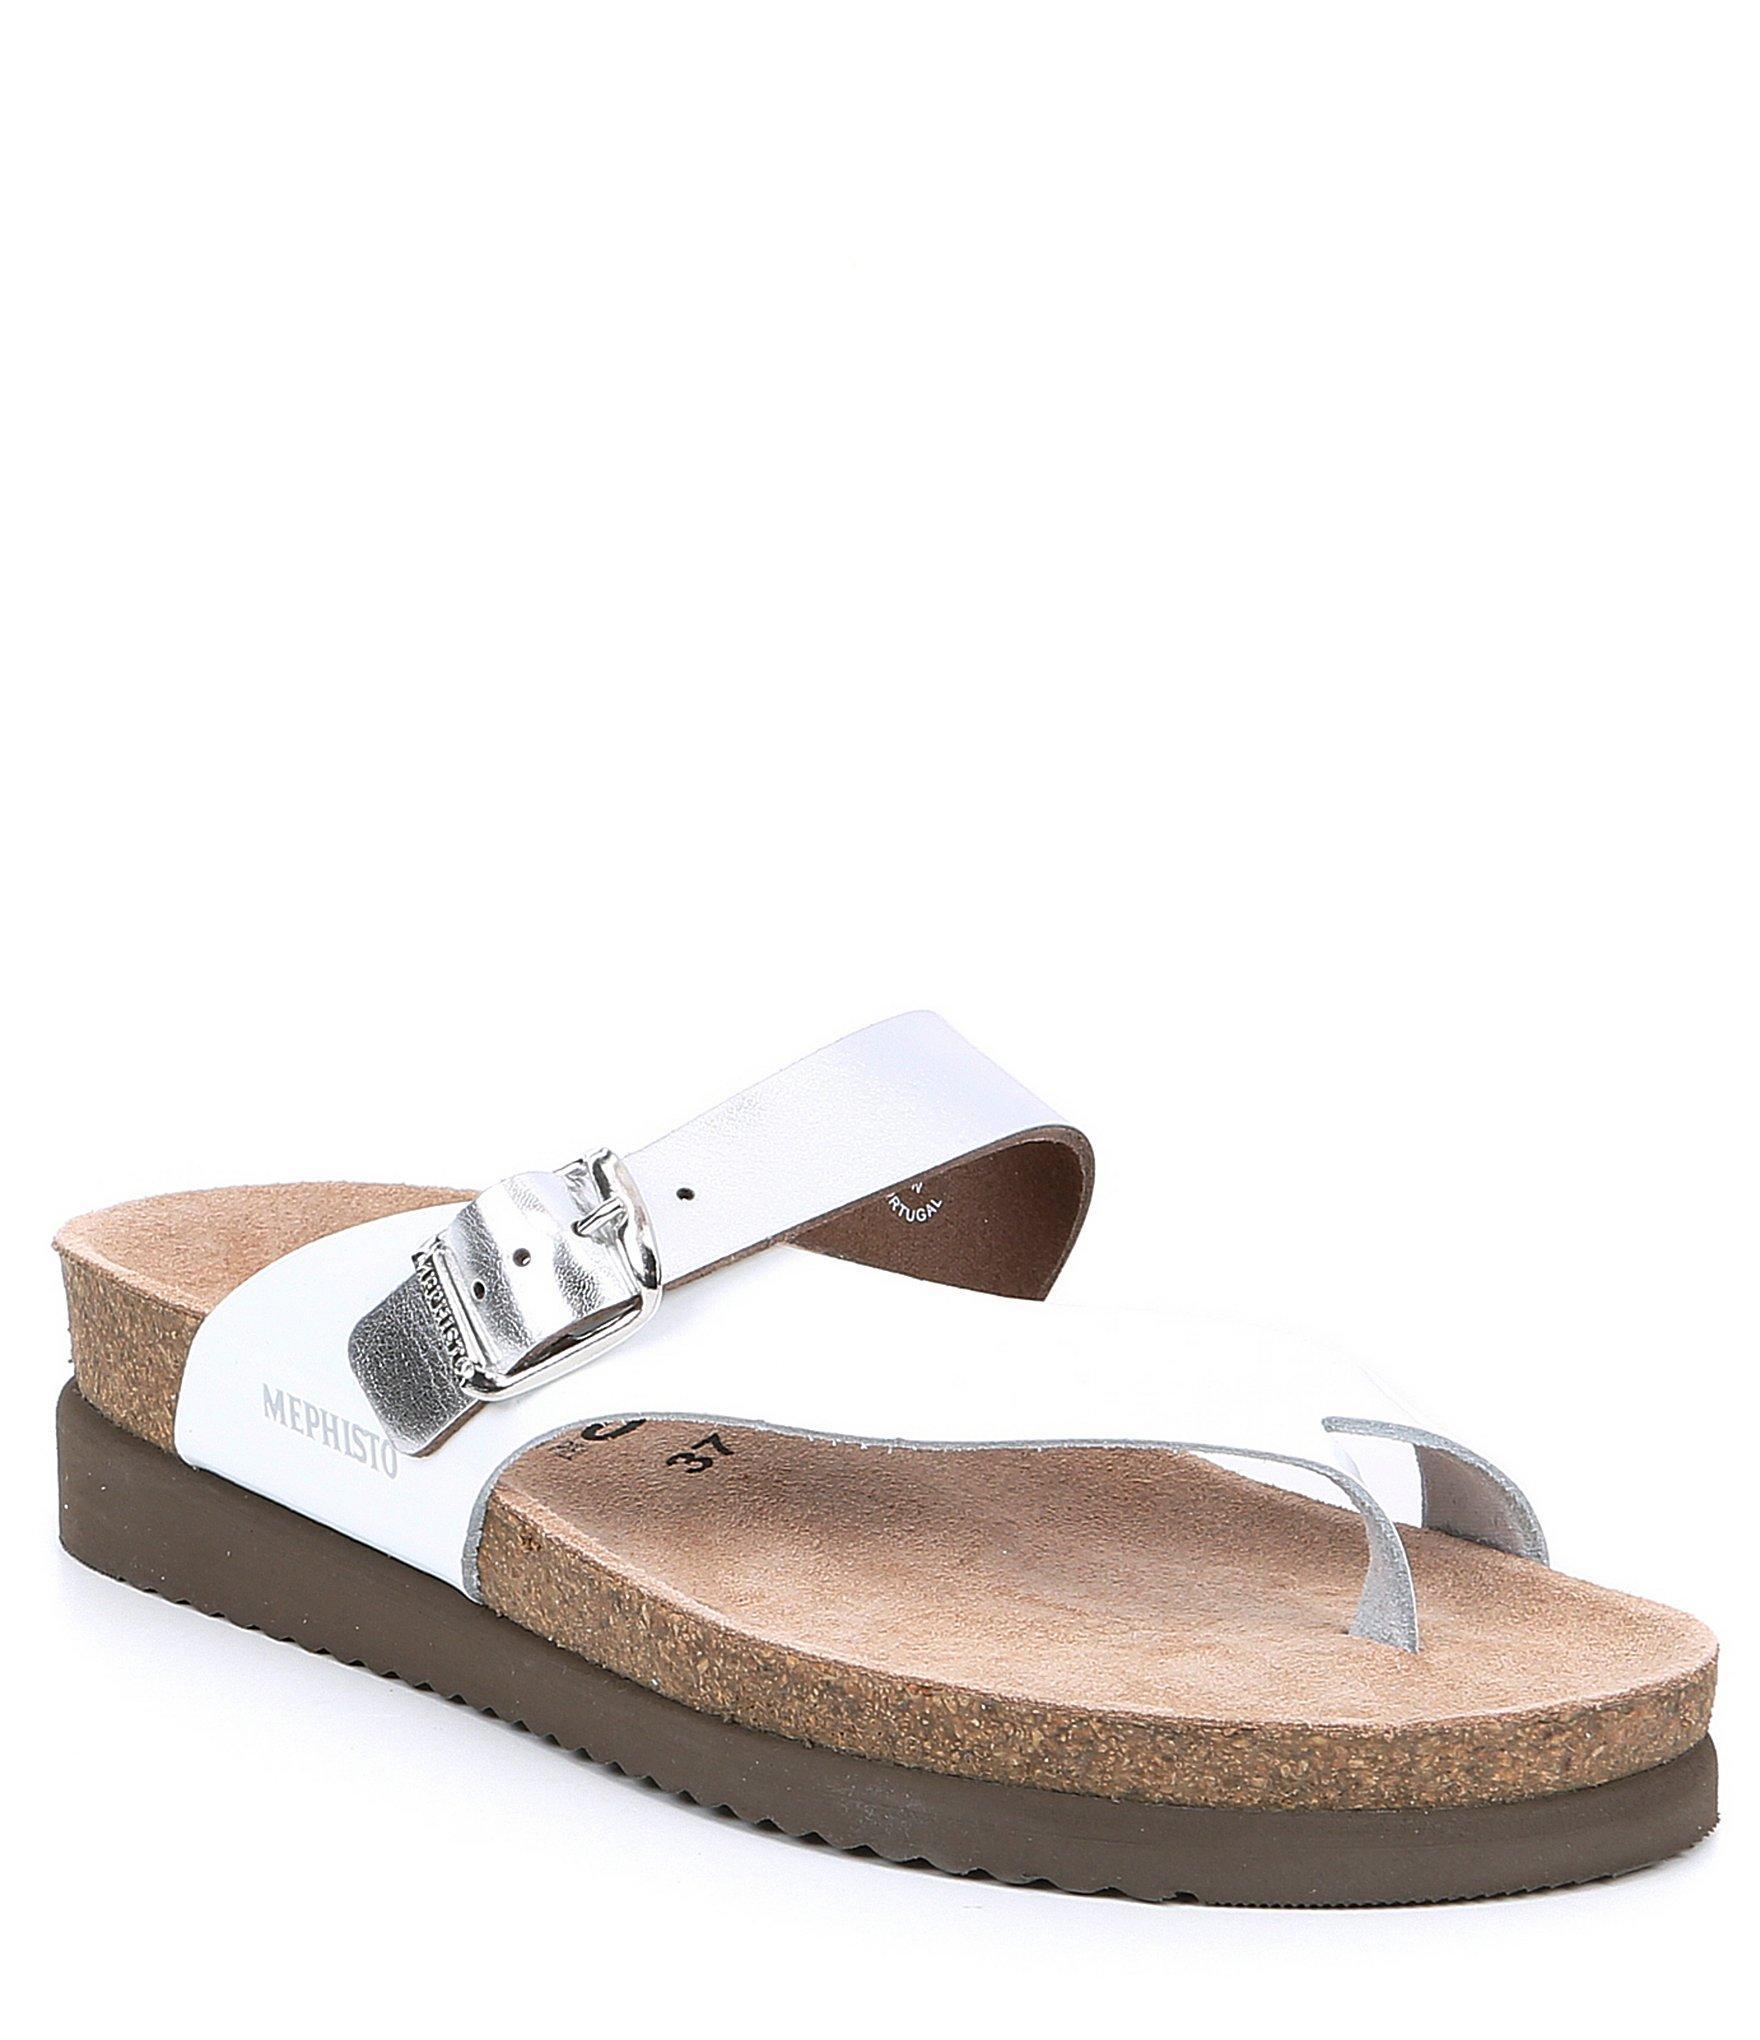 7e7ff60b11 Mephisto - Multicolor Helen Mix Slide Thong Sandals - Lyst. View fullscreen